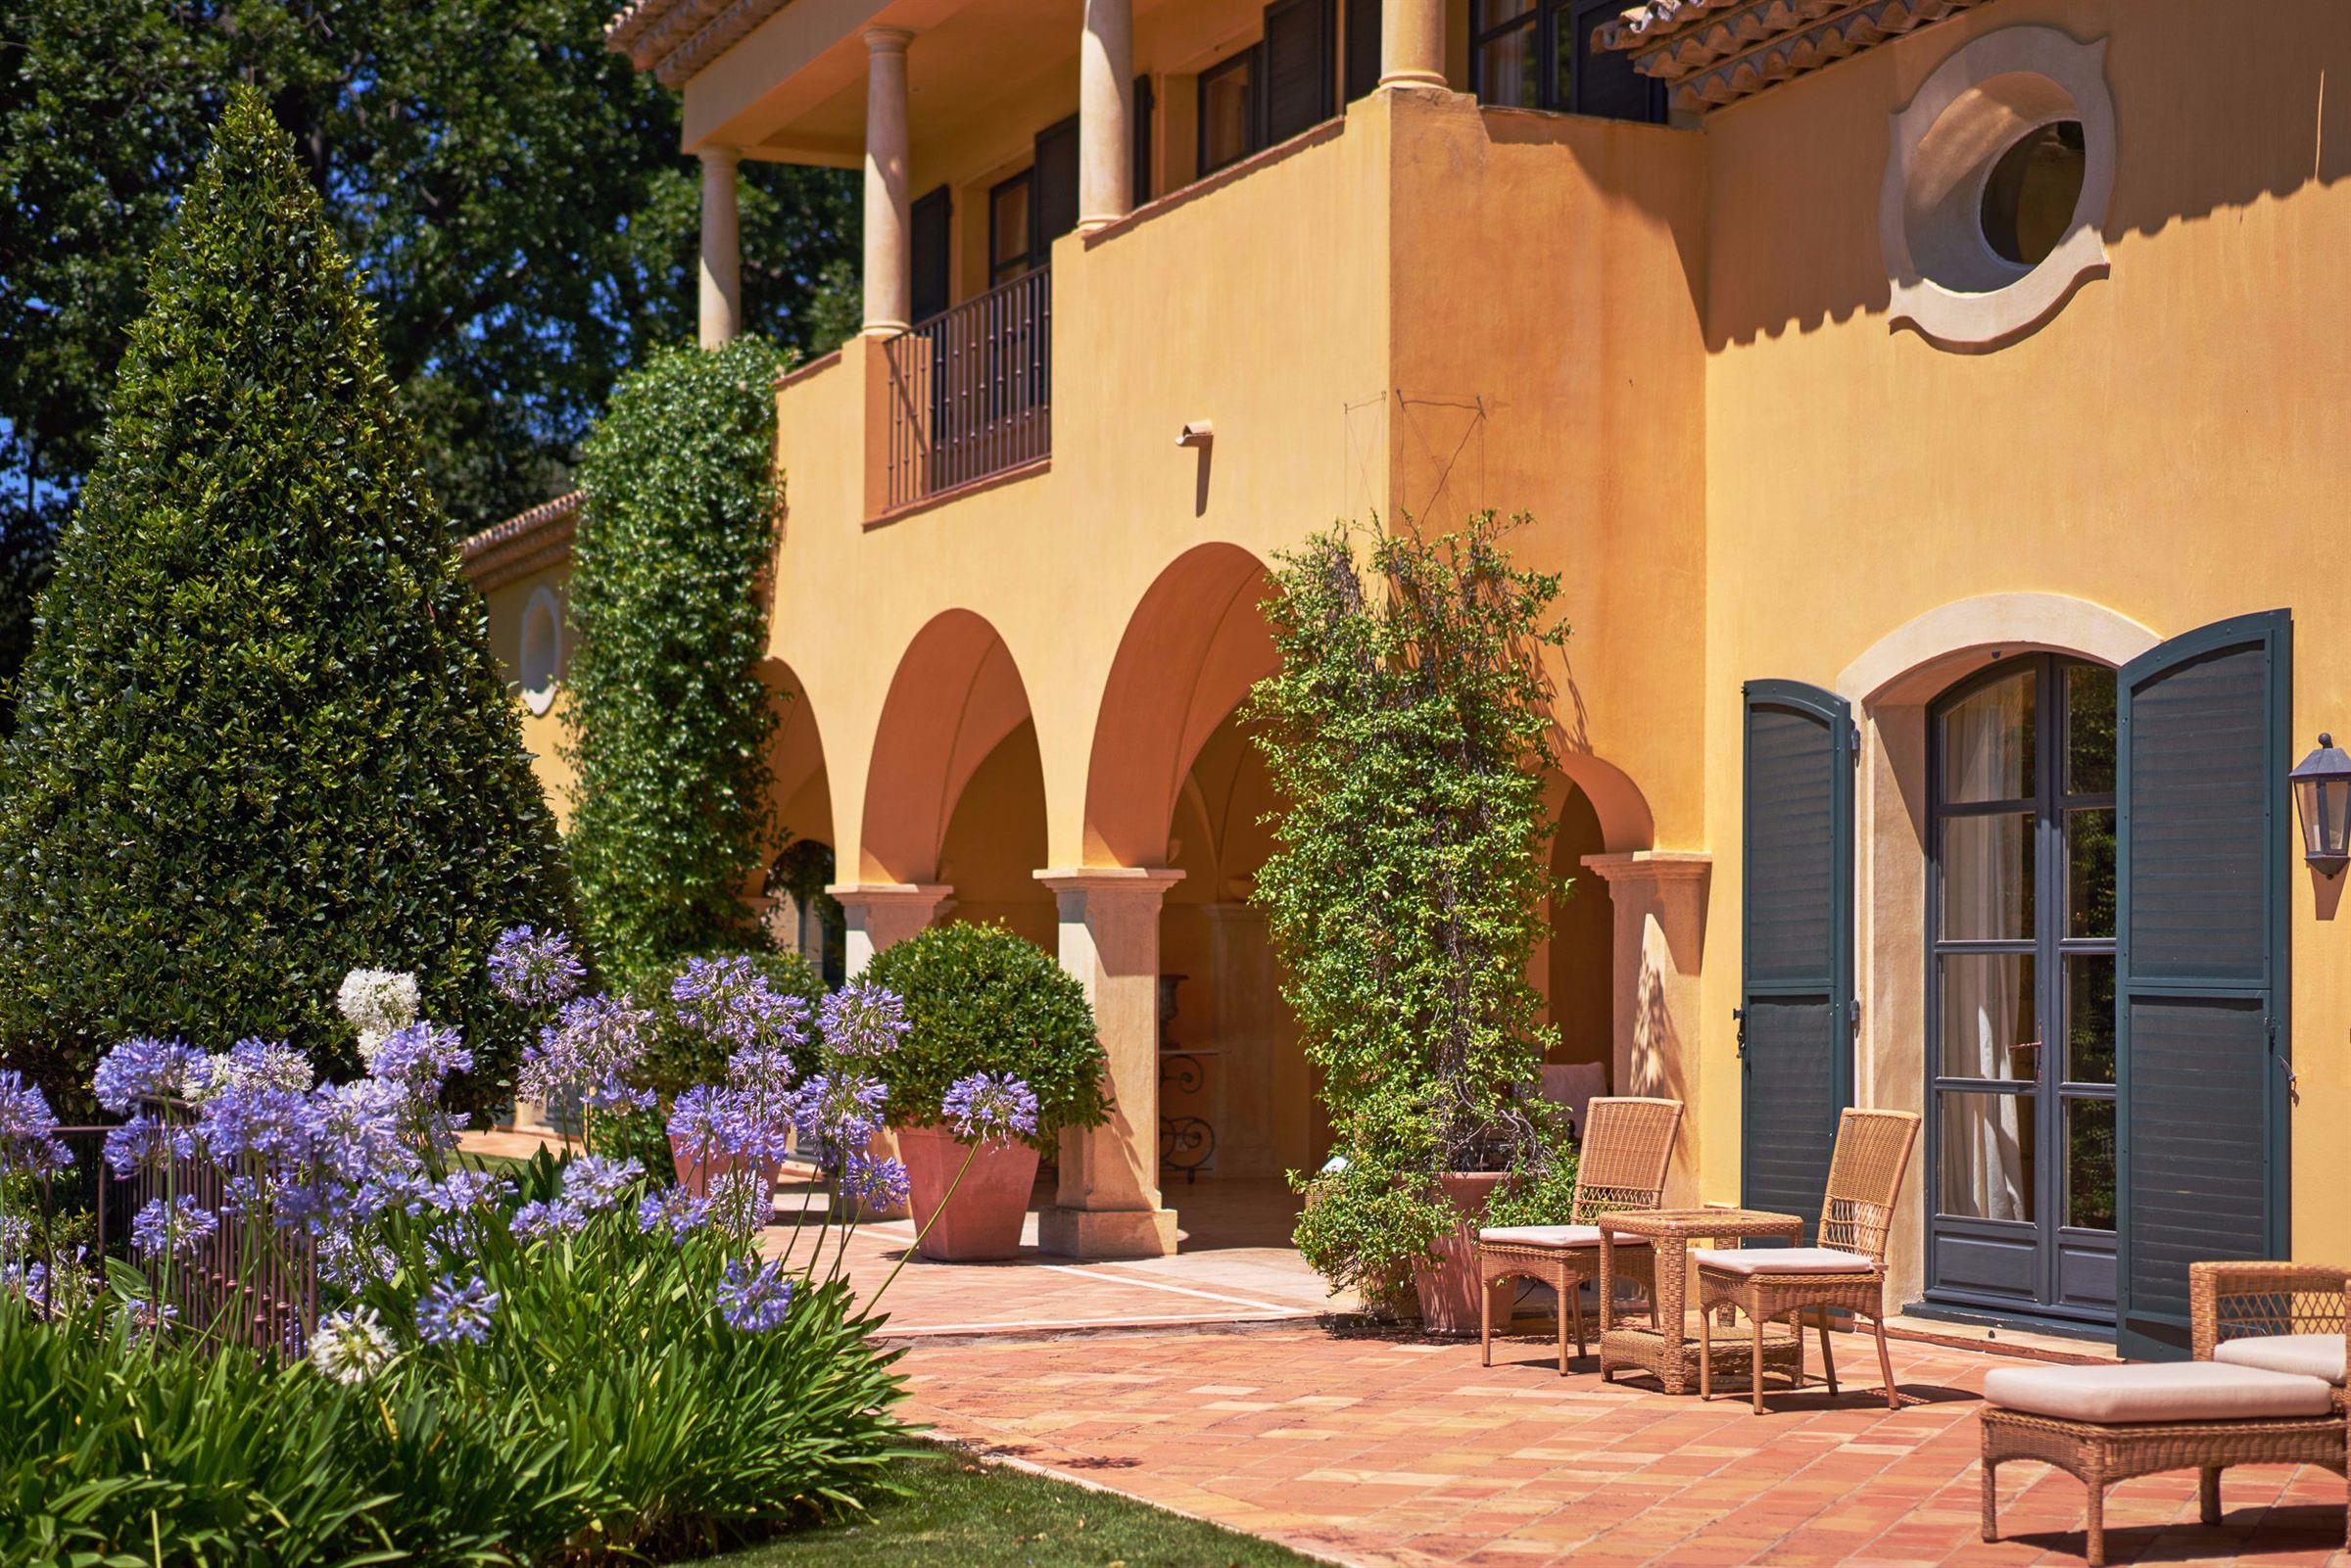 Villa per Vendita alle ore Charming property with sea views Mougins, Provenza-Alpi-Costa Azzurra, 06250 Francia